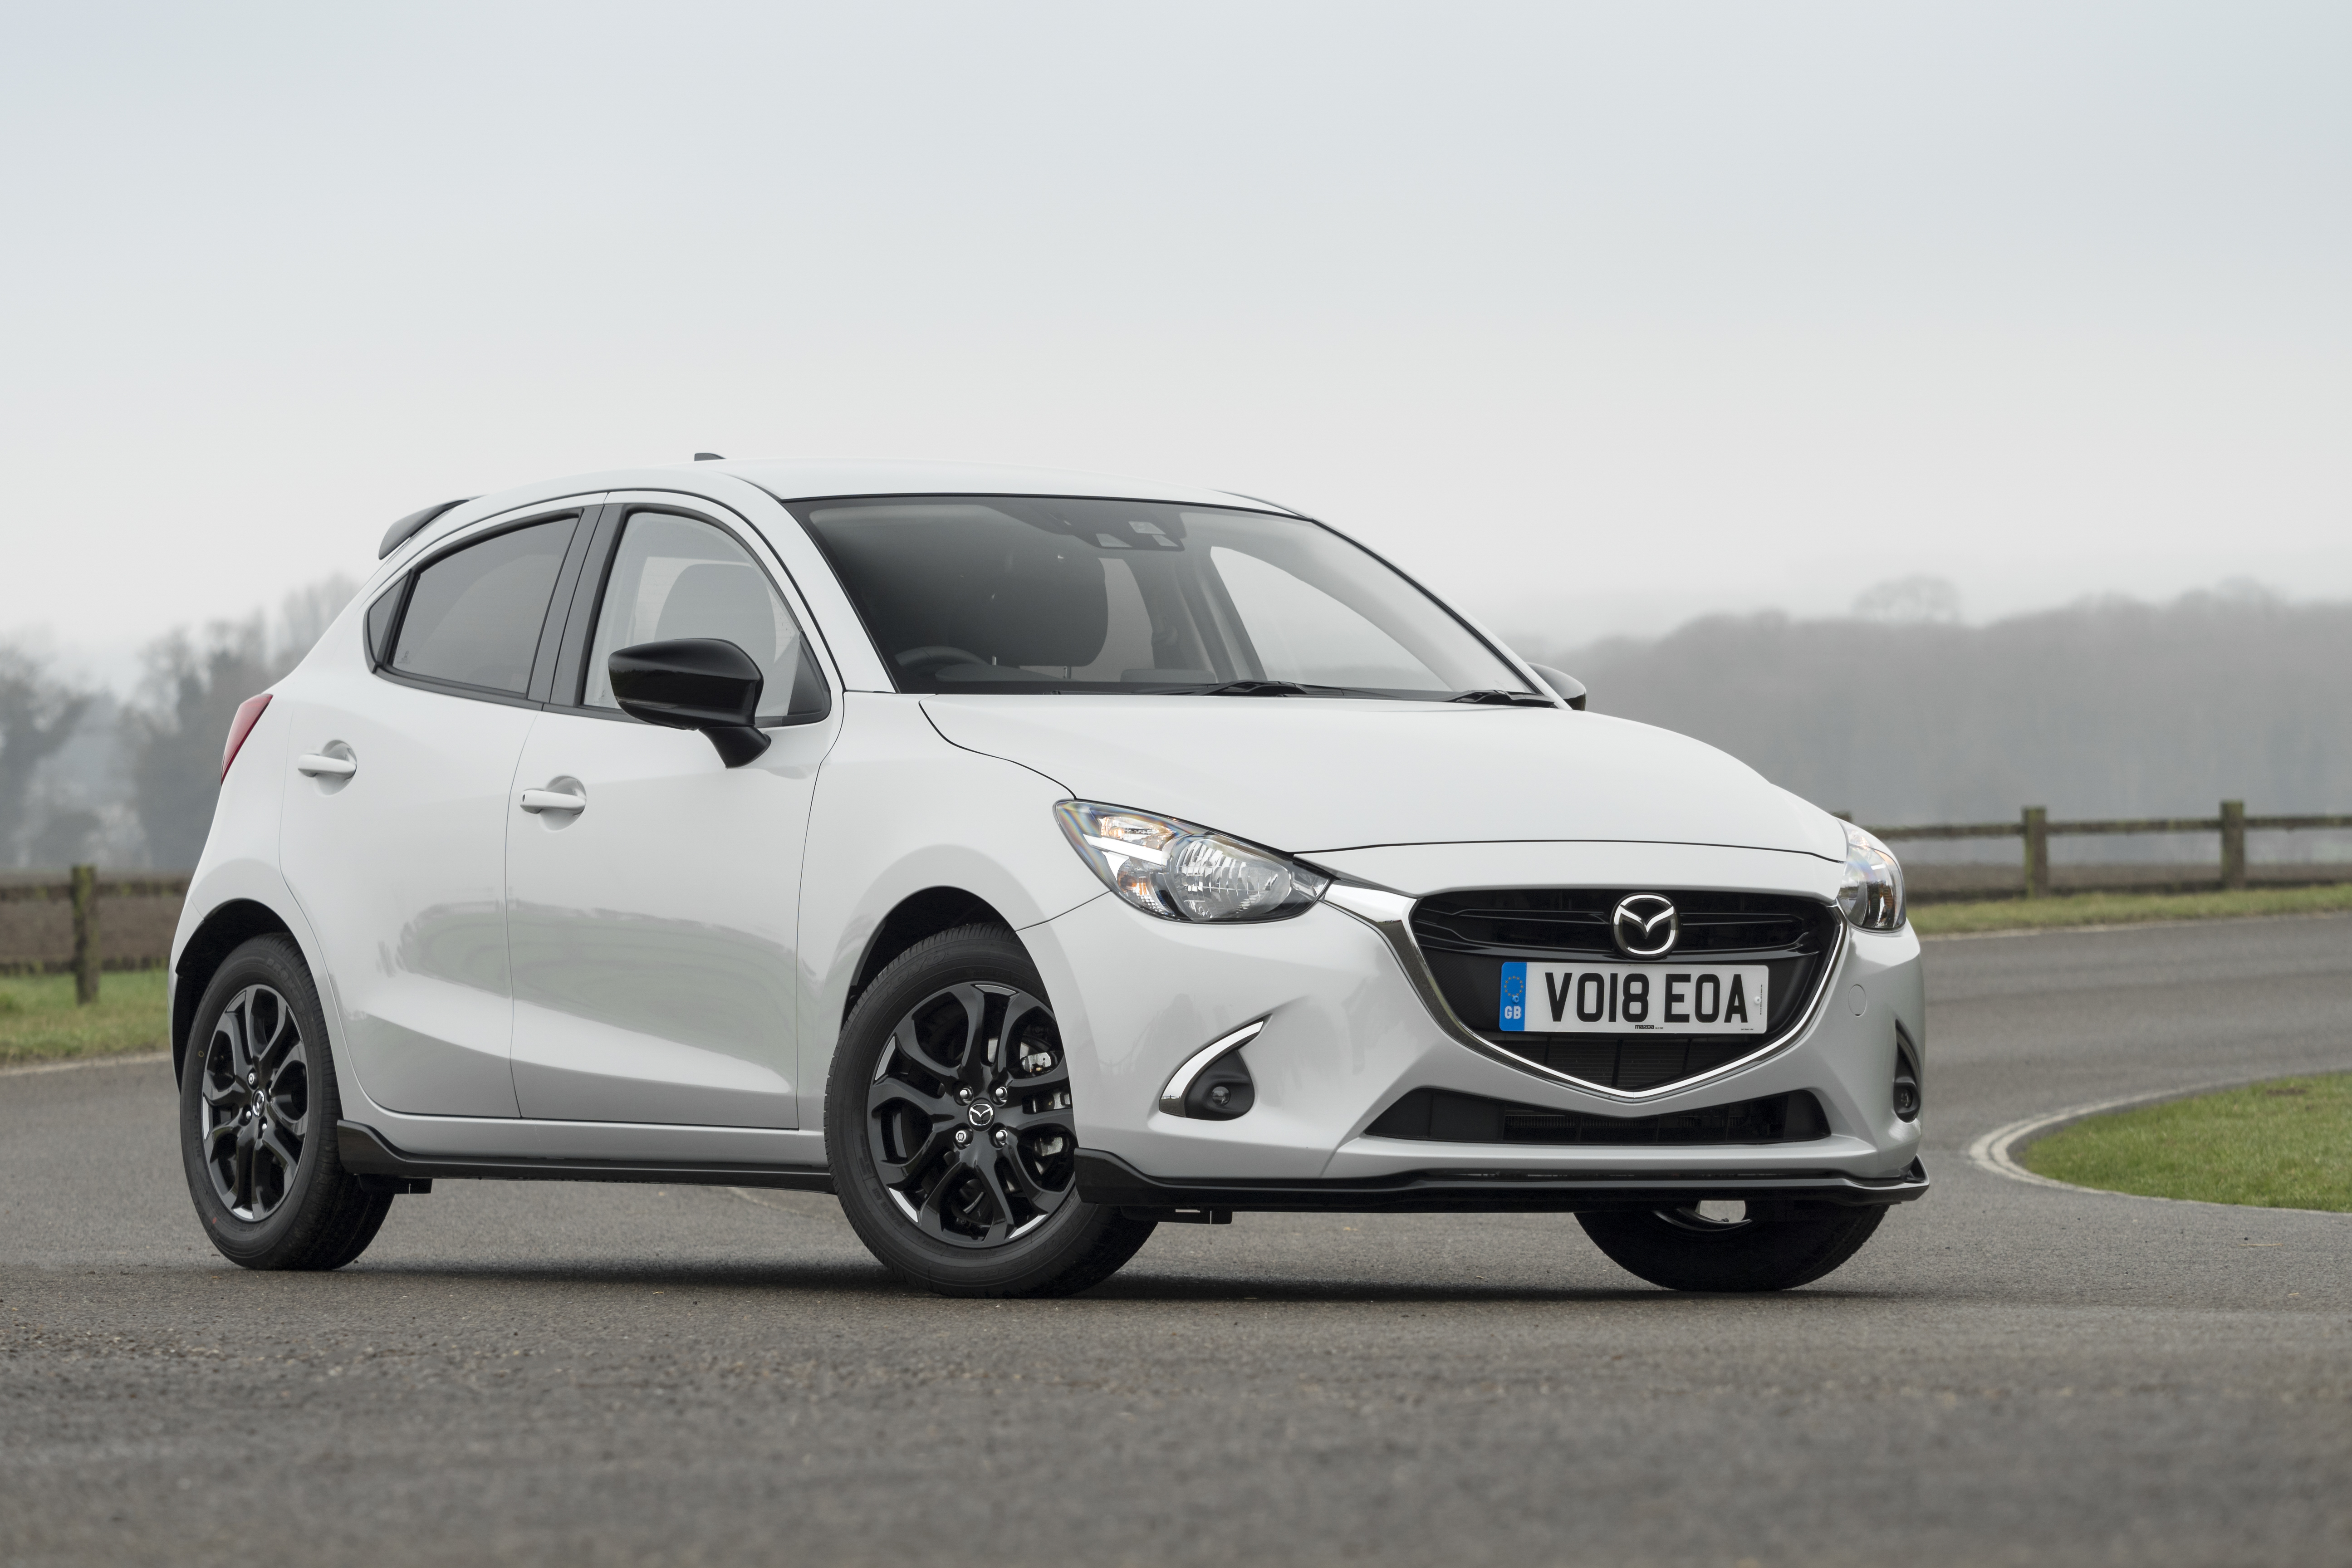 Kelebihan Kekurangan Mazda 2 Hatchback 2018 Tangguh